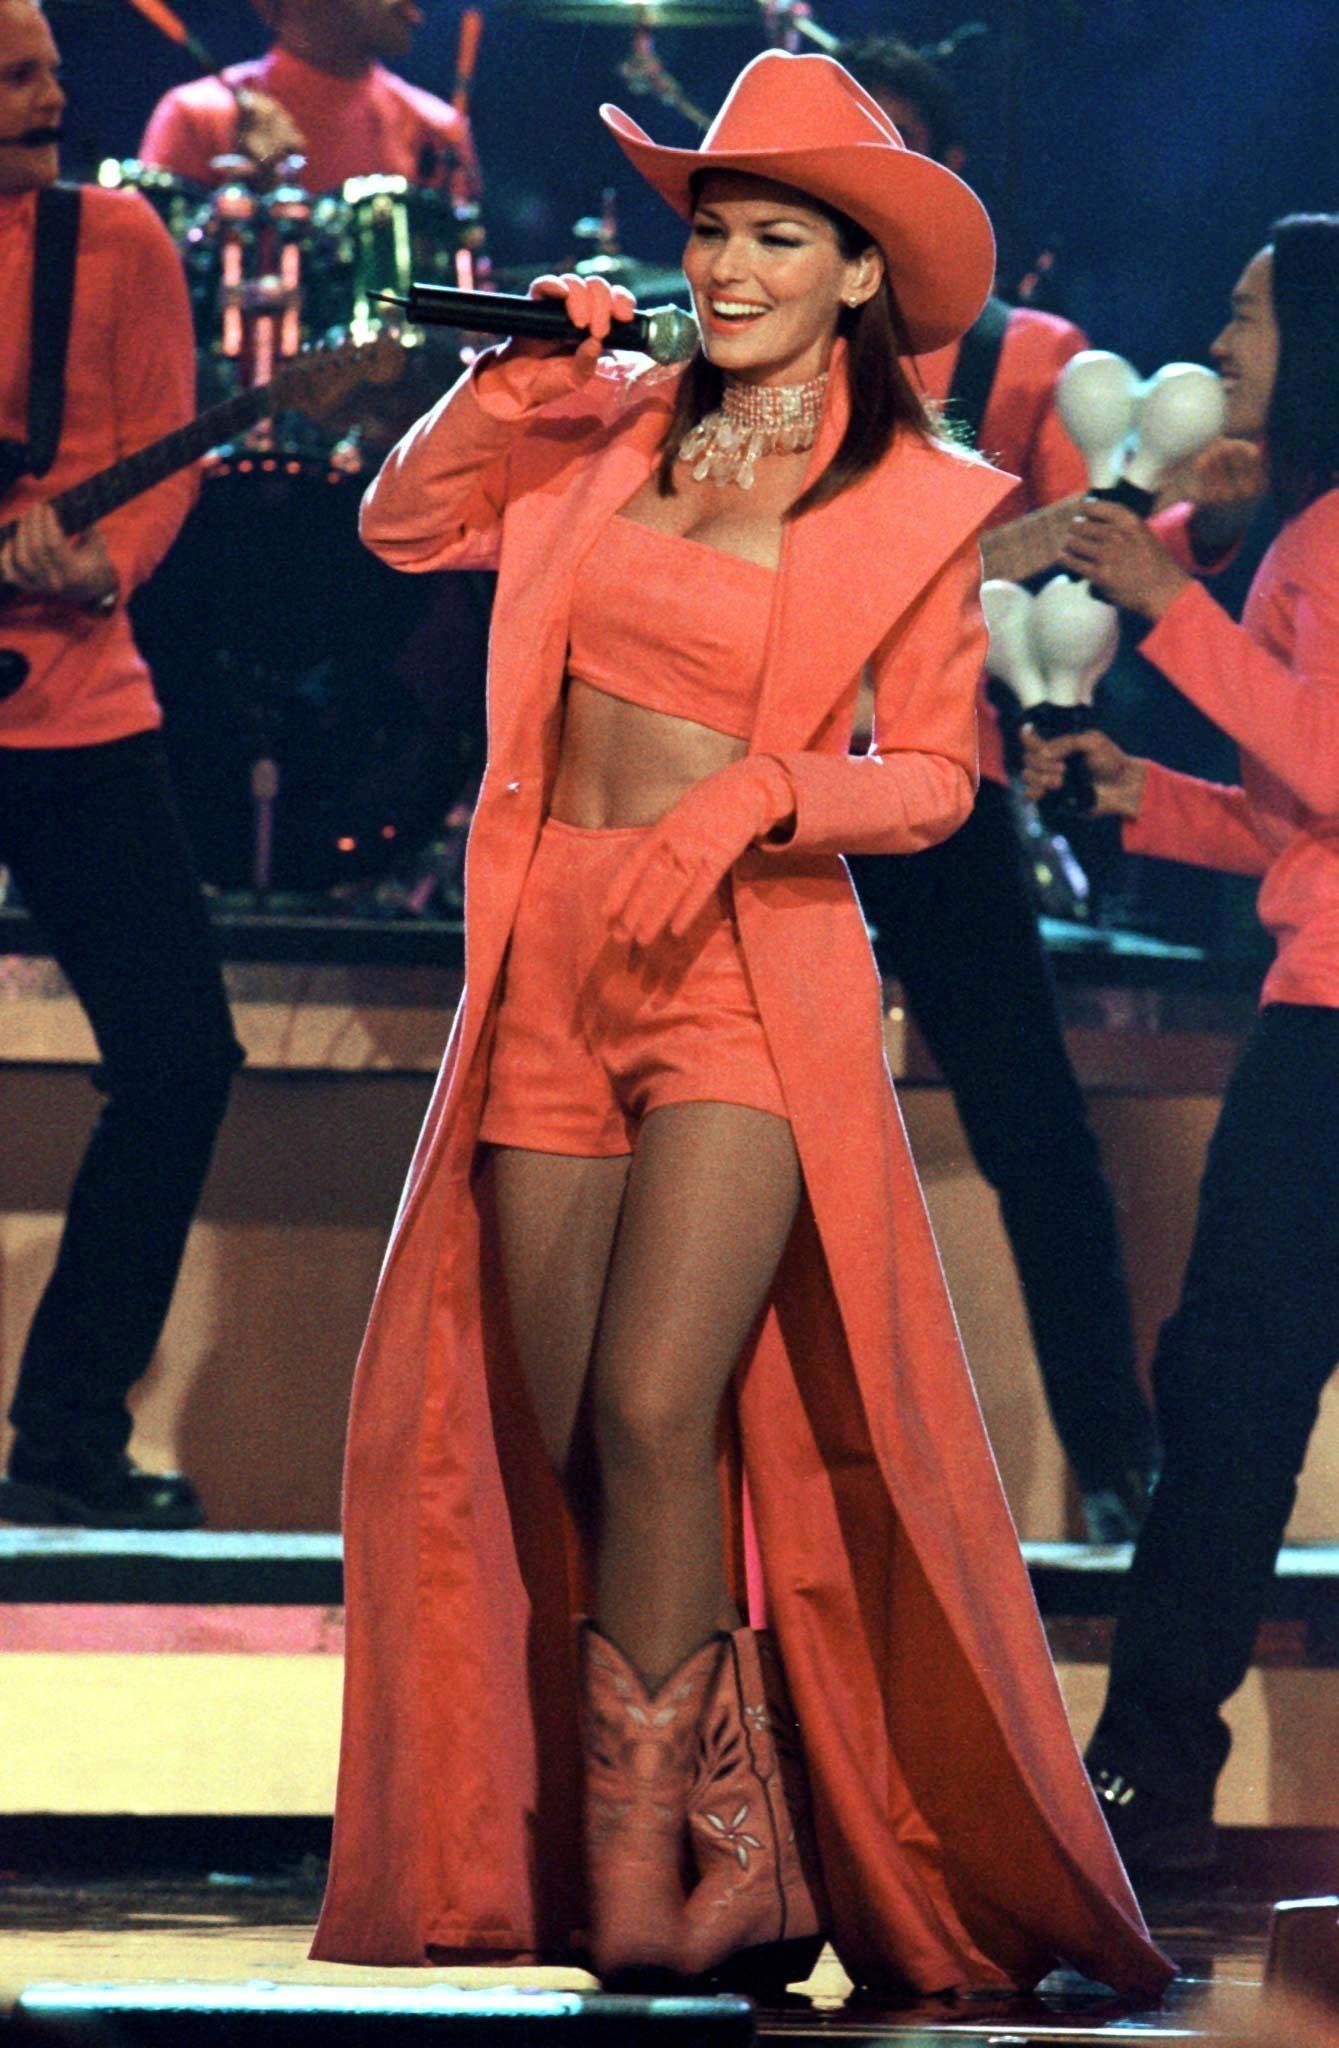 Shania Twain Orange Boots Colororange Country Music